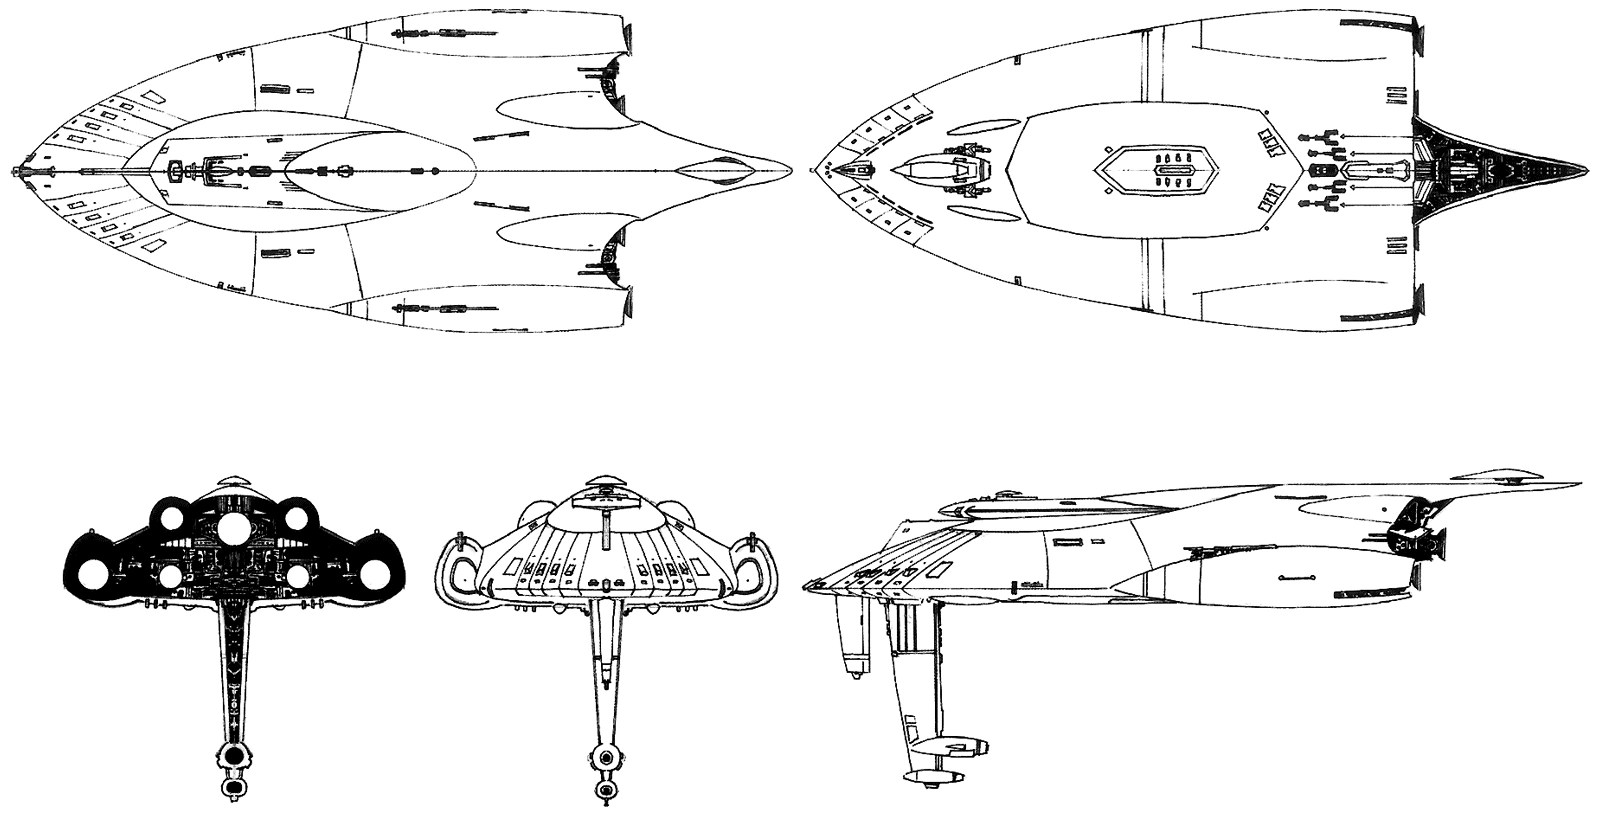 Shashore Class Frigate